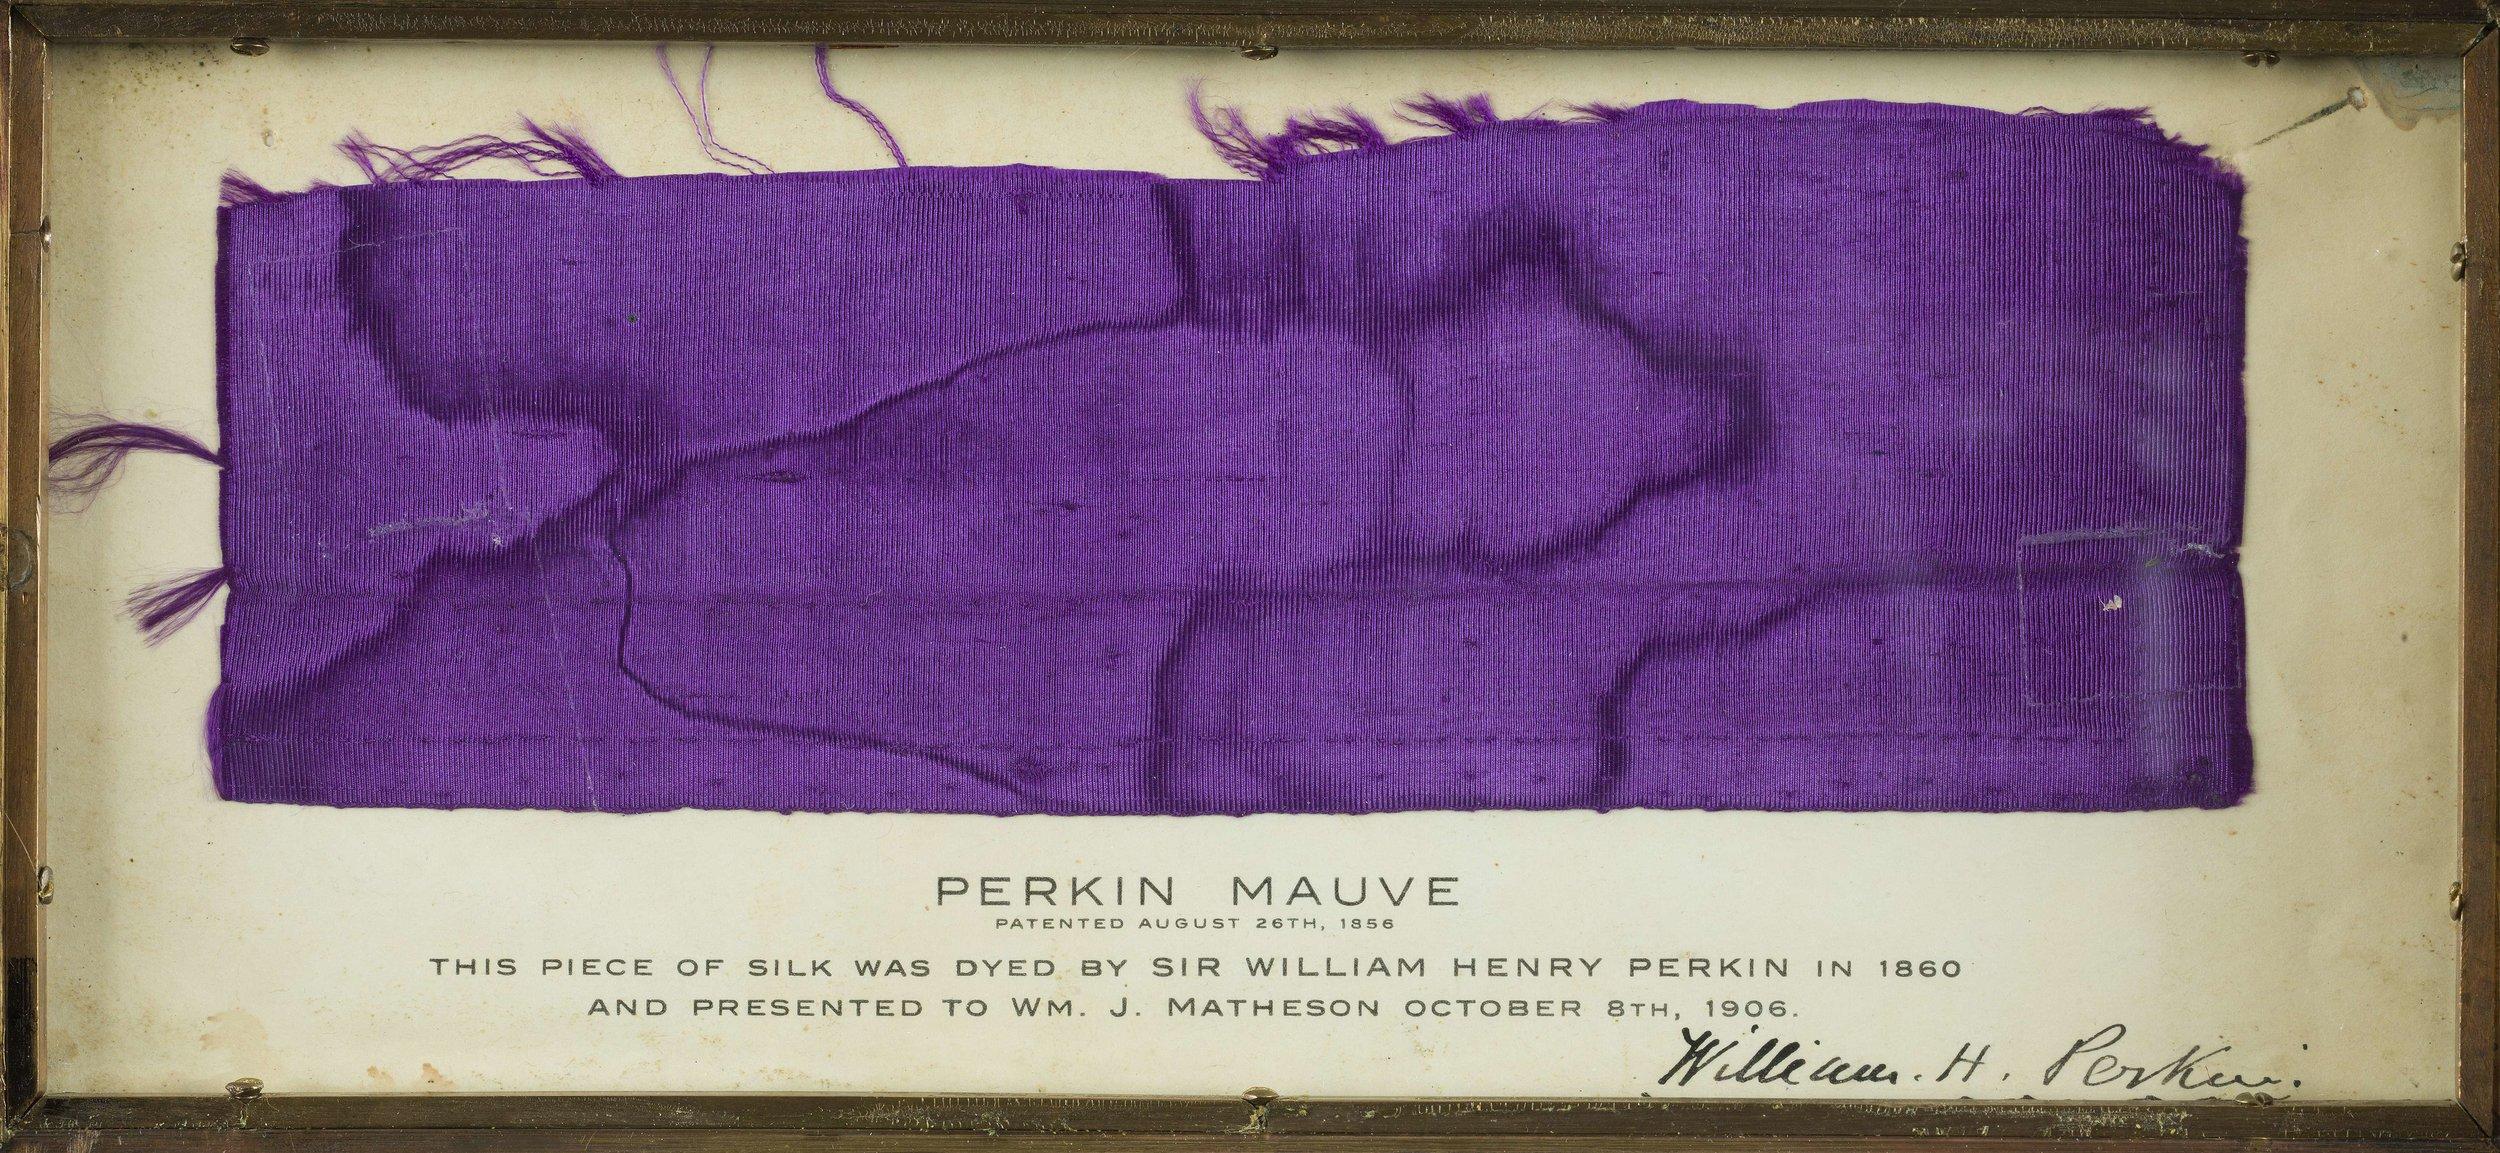 Episode 4: The Color Purple -